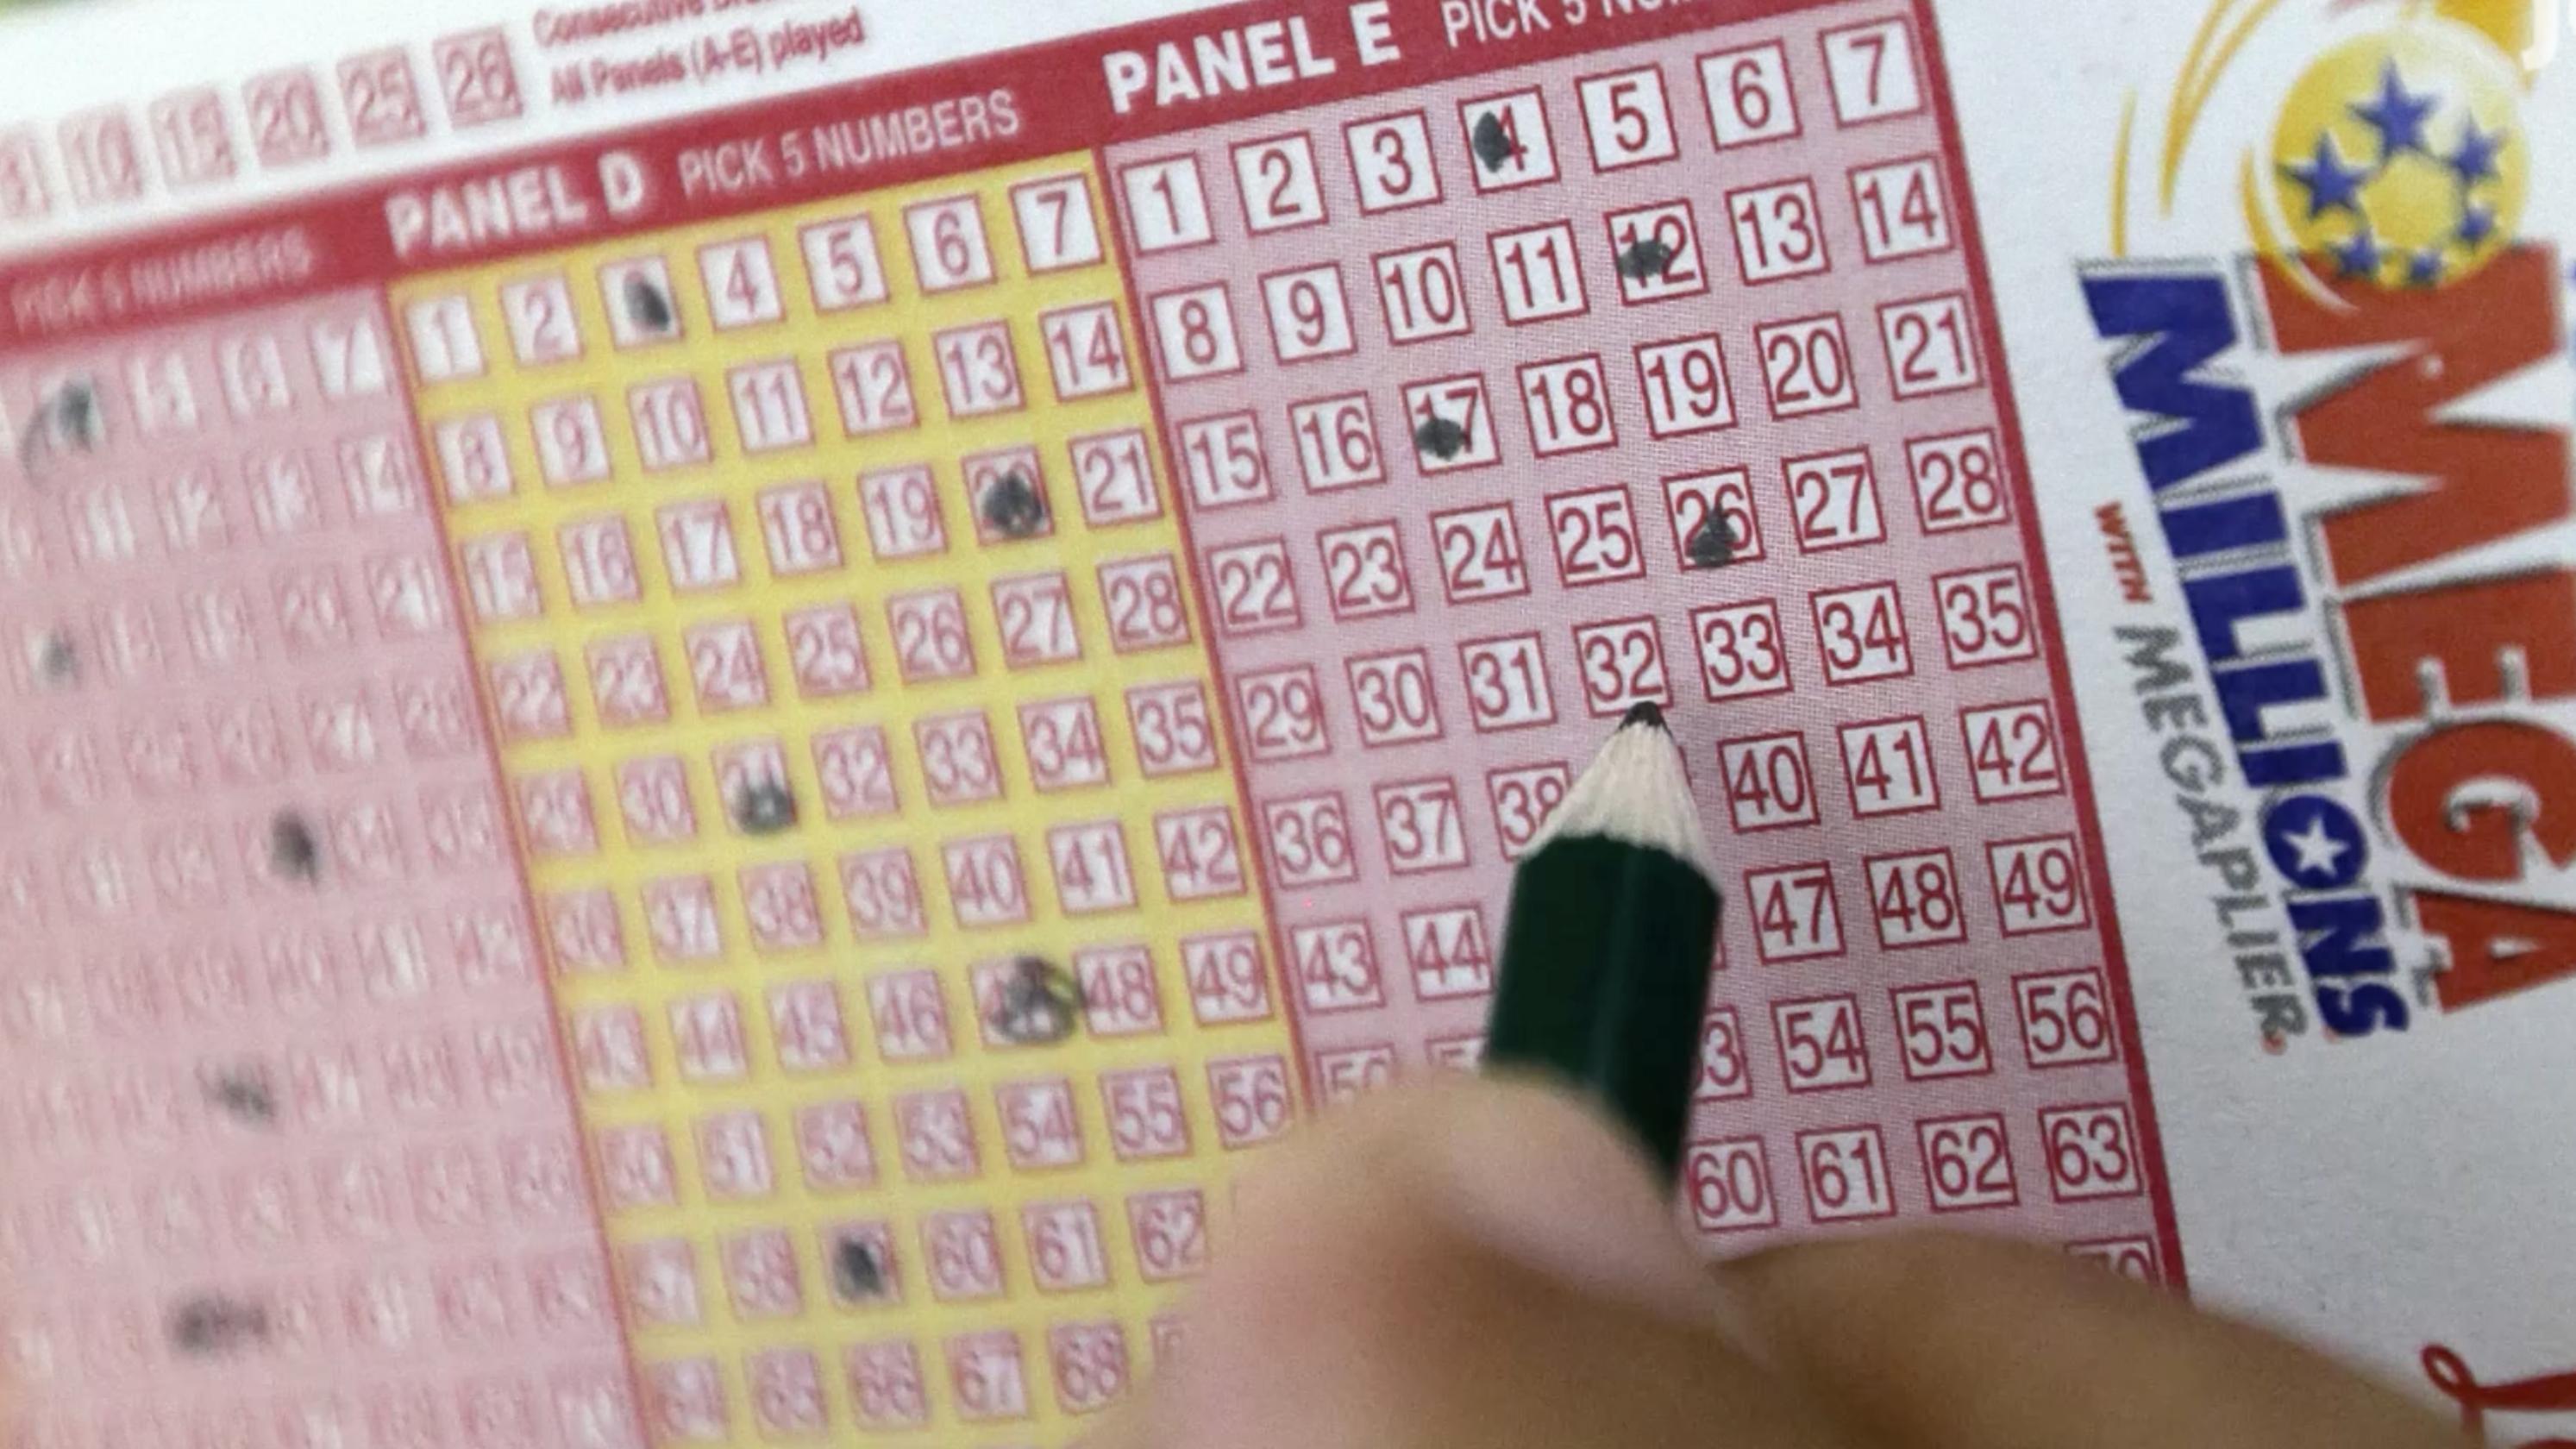 905cc818d0fd How will winning the  900M Mega Millions jackpot change your life